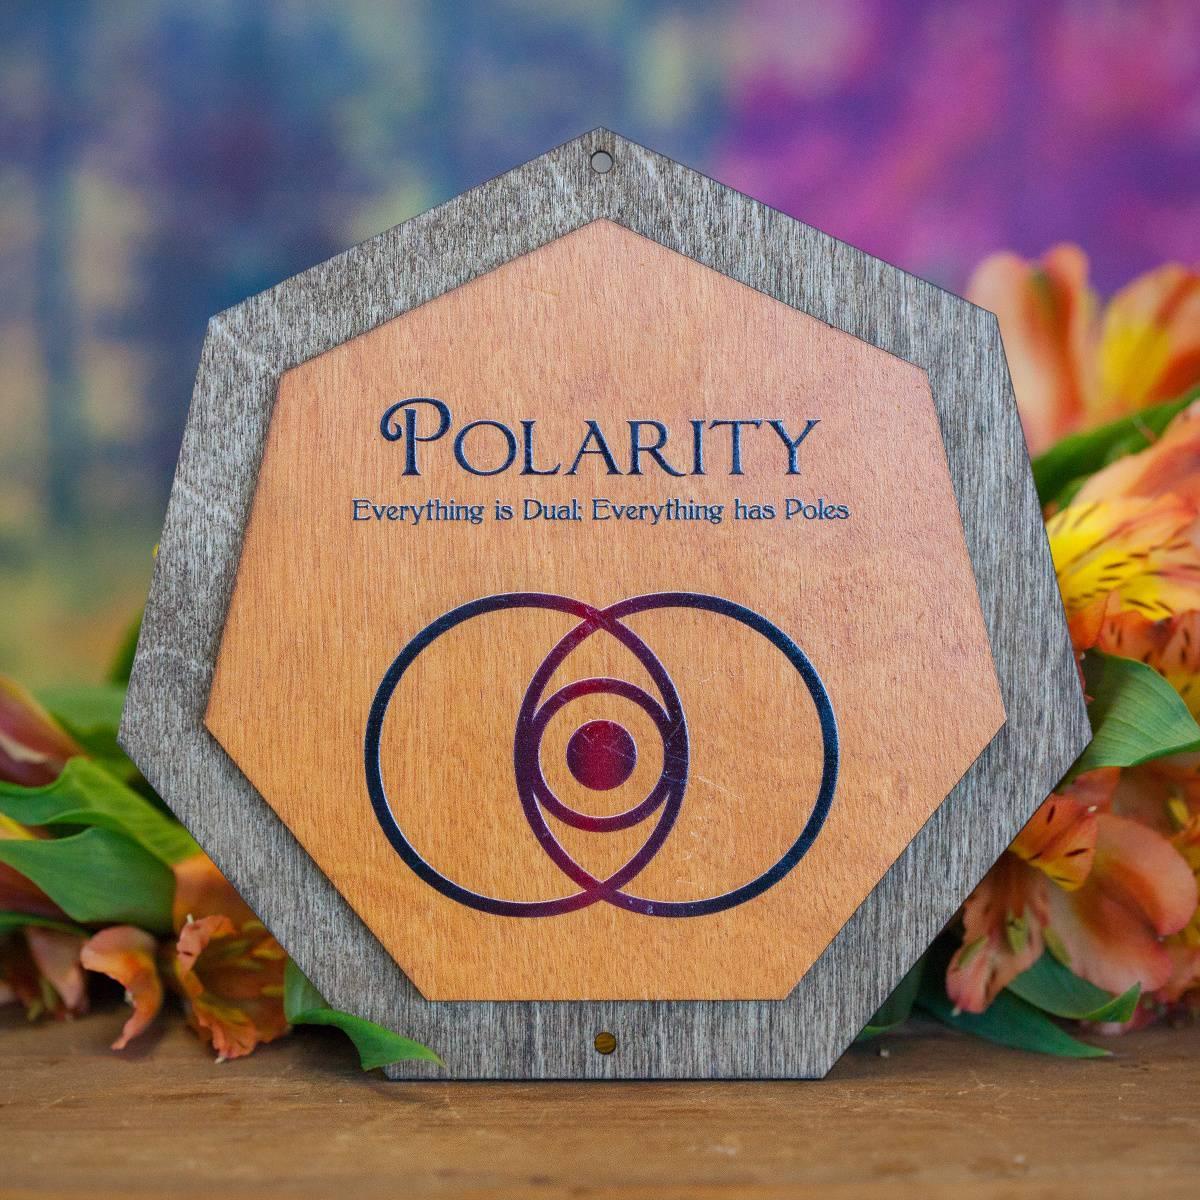 Hermetic_Principles_MOM_Polarity4of4_7_1